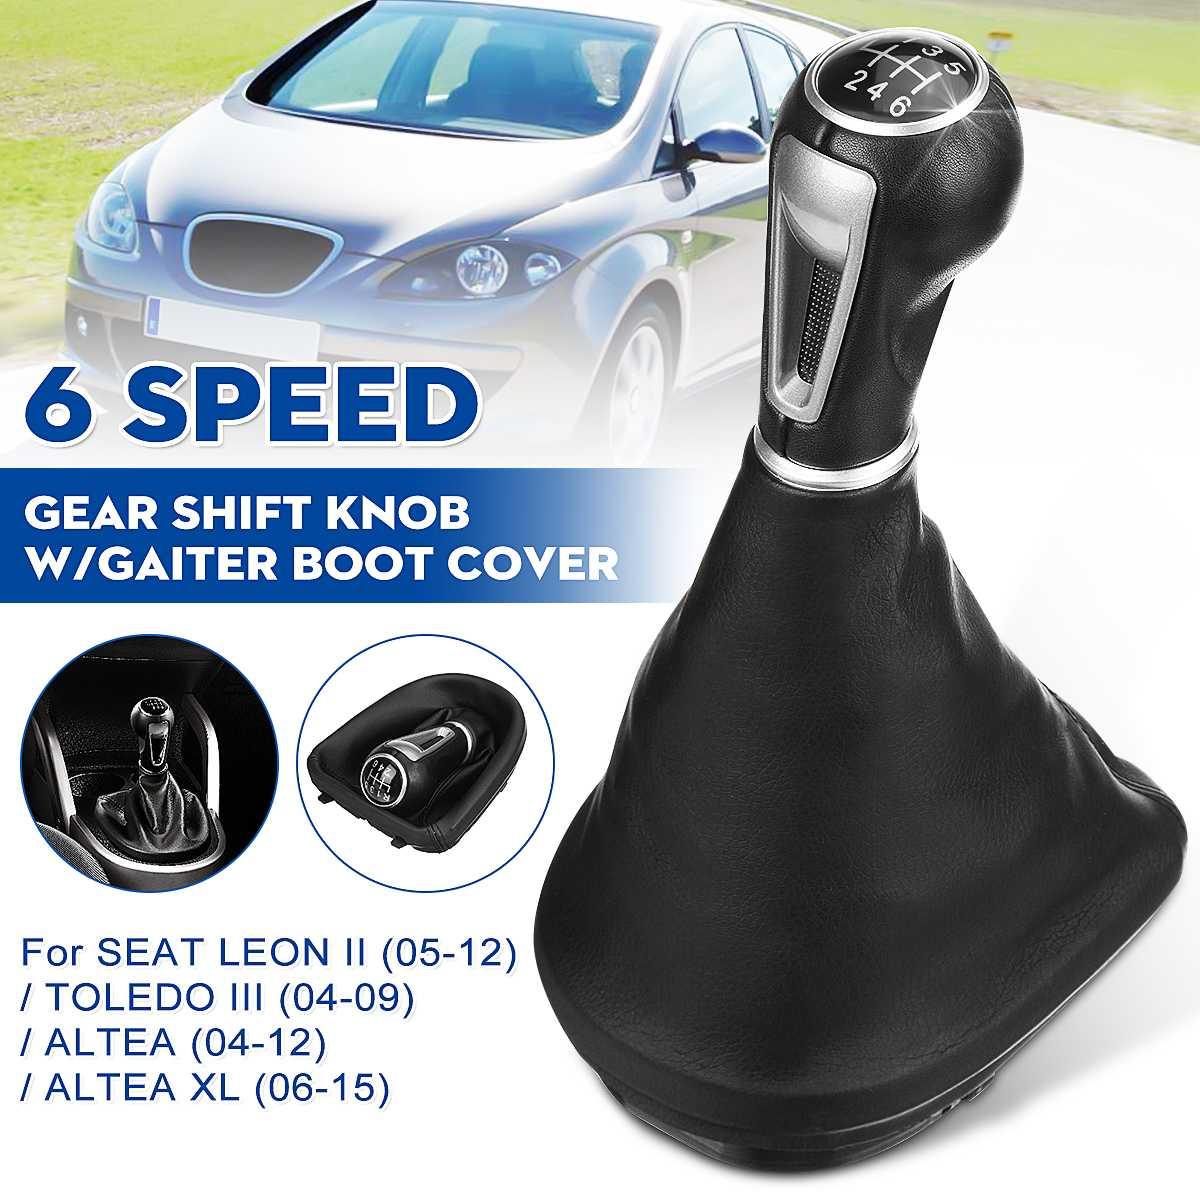 5/6 Speed Gear Shift Knob Lever Shifter Handle Stick W/Gaiter Boot Cover For Seat Leon II/Toledo III Altea XL